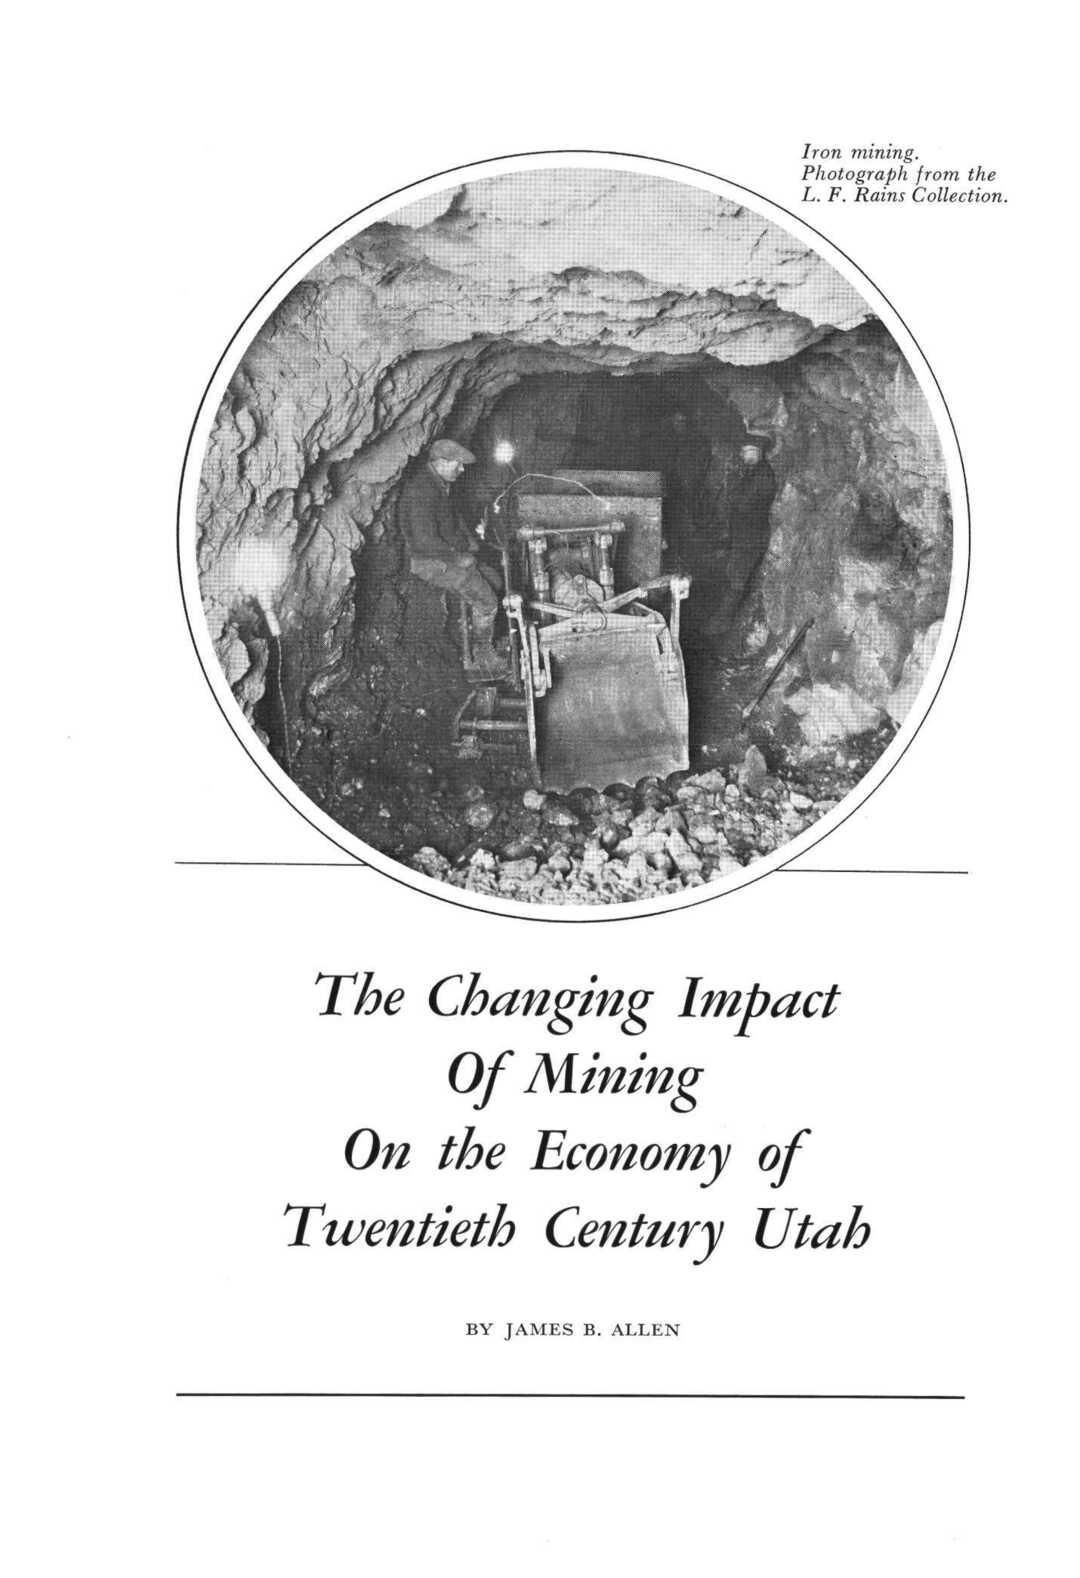 story from: Utah Historical Quarterly, Volume 38, Number 3, 1970